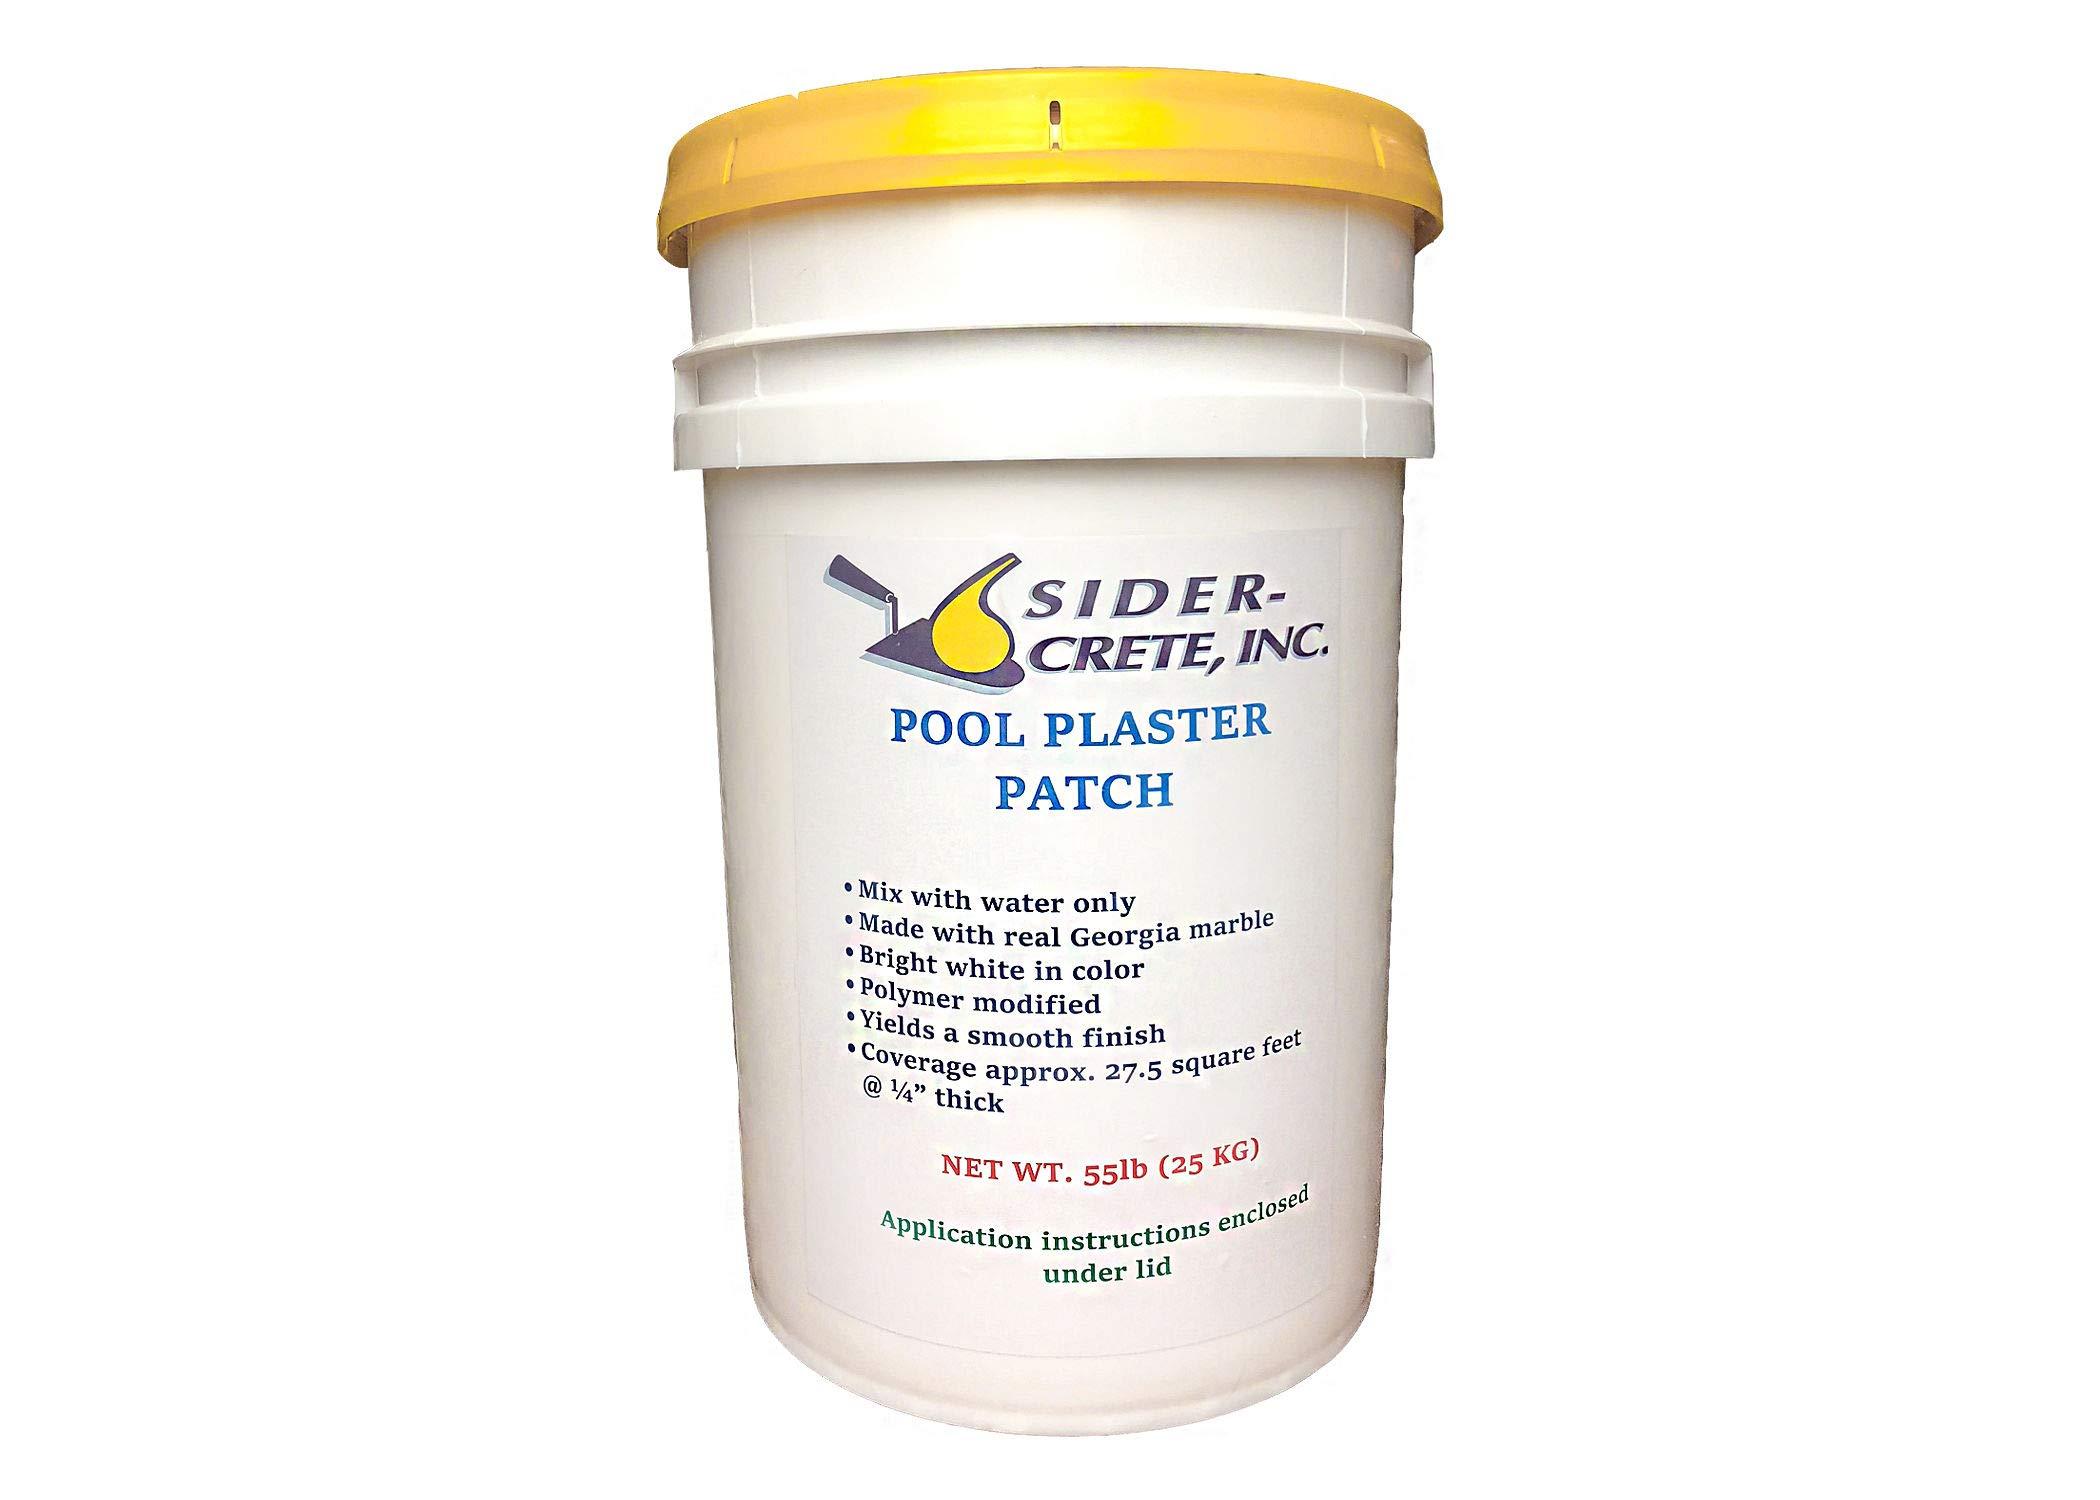 Sider Pool Plaster Patch White- 55 lb - Bonus 5 lb Added for The Same by Sider-Crete